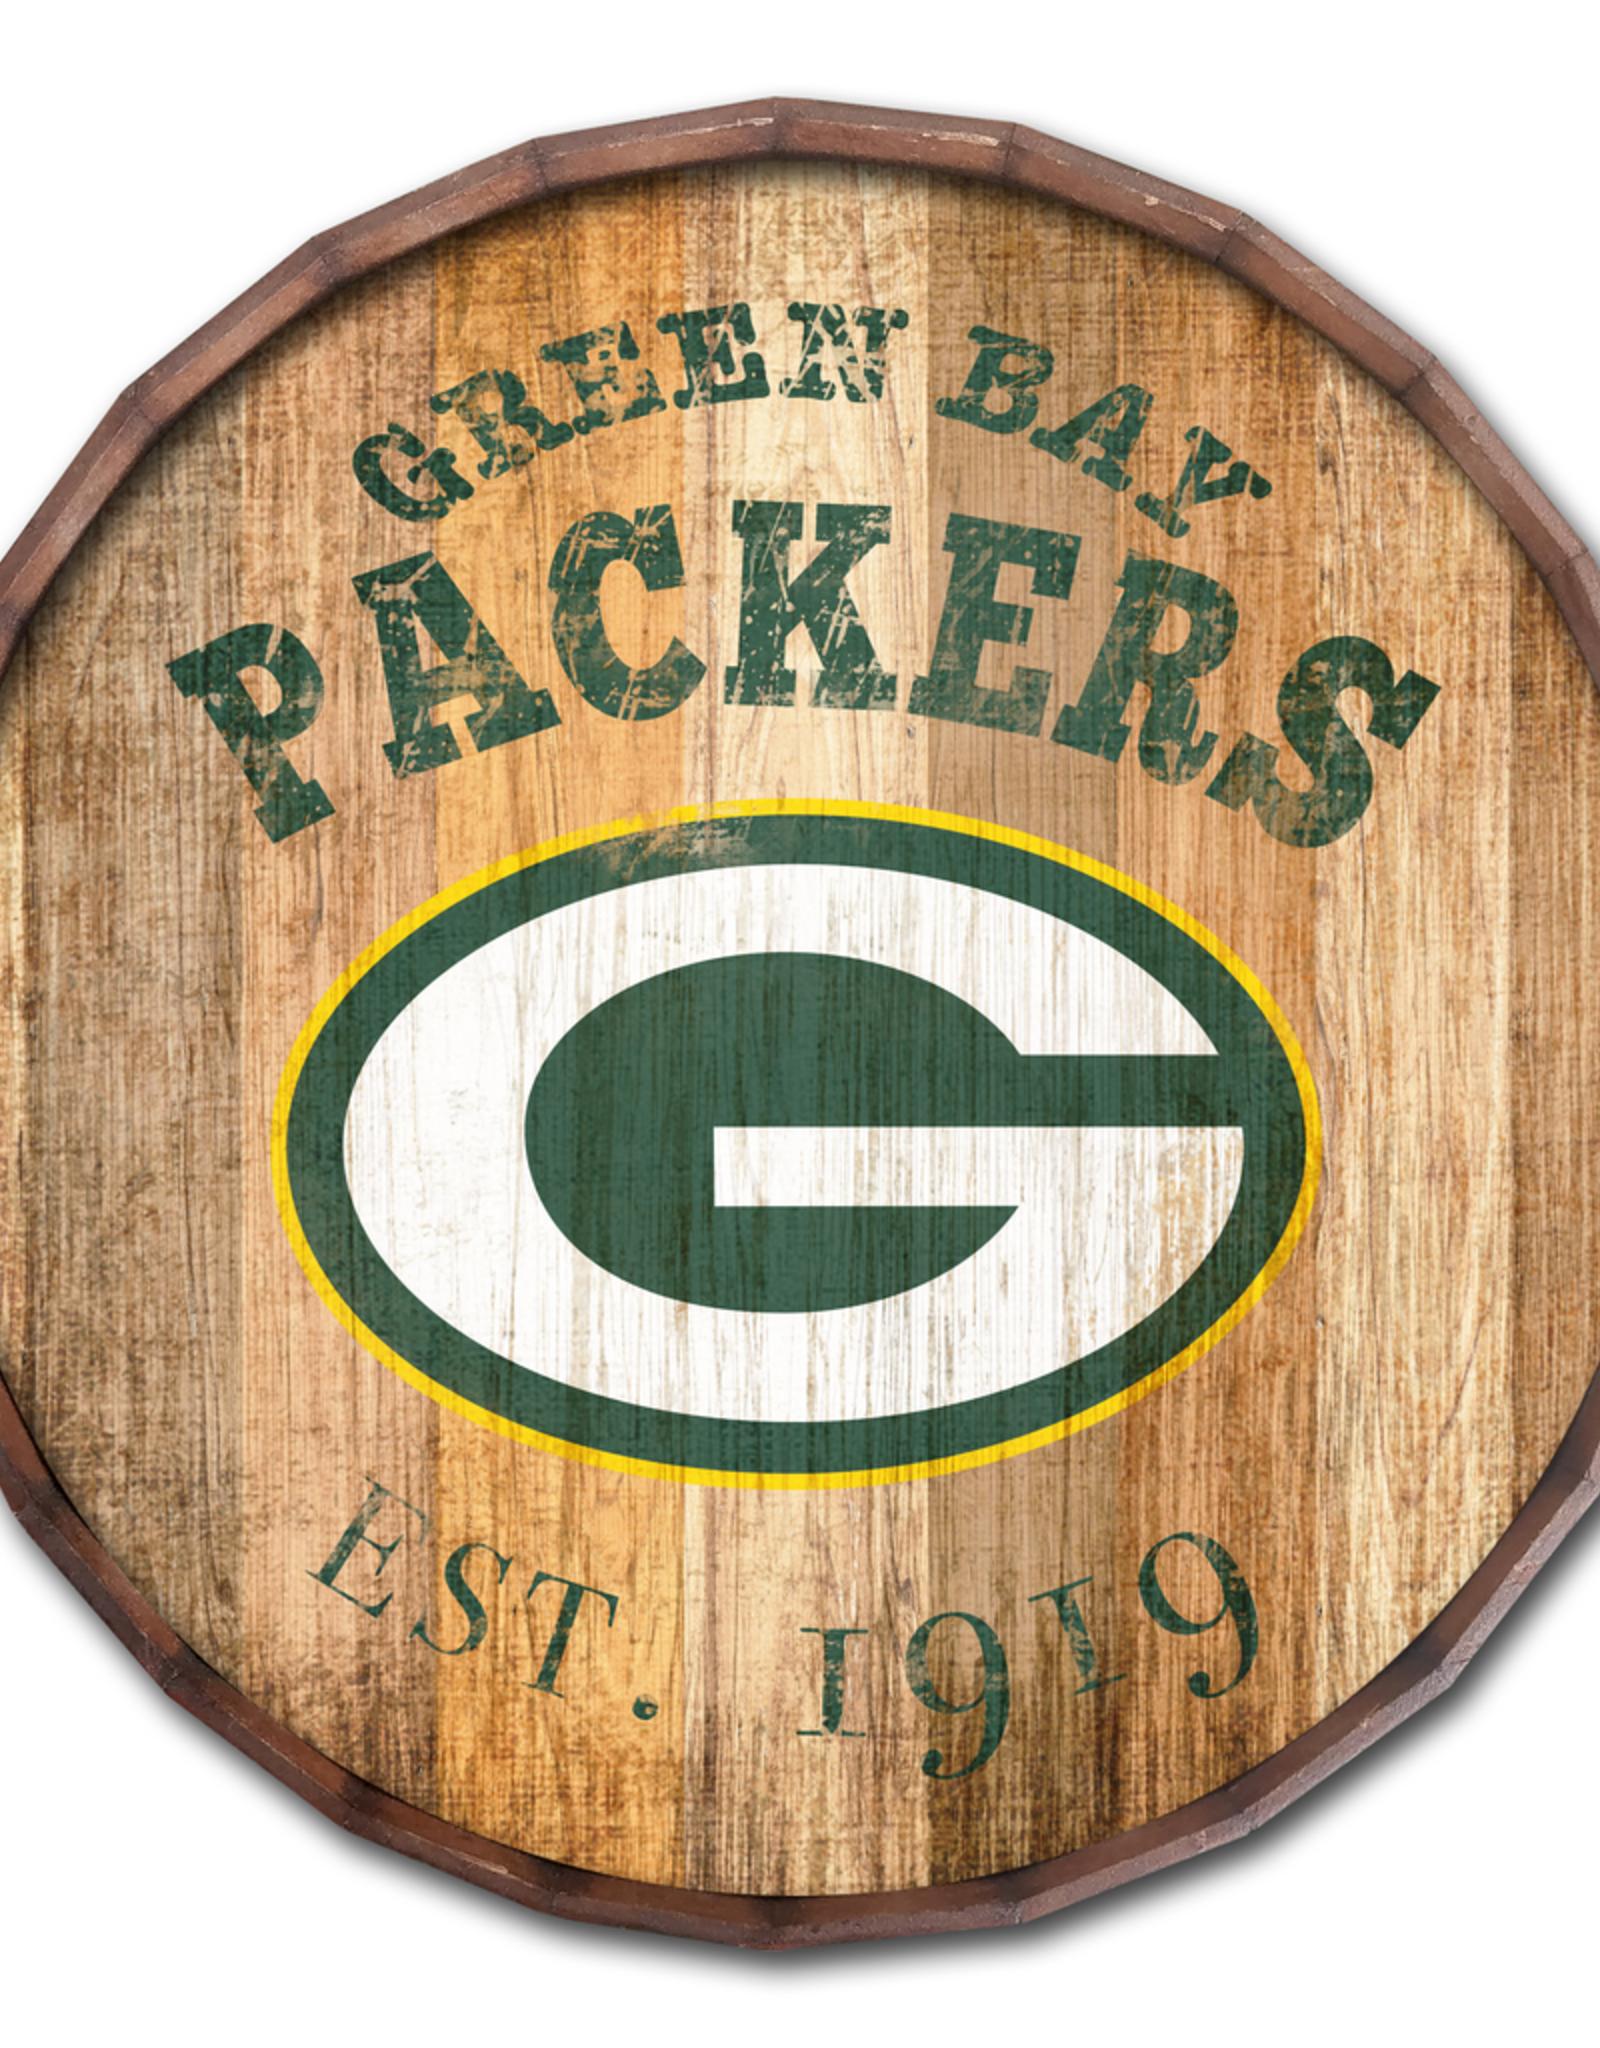 "FAN CREATIONS Green Bay Packers 16"" Cracked Barrel Top -EST"